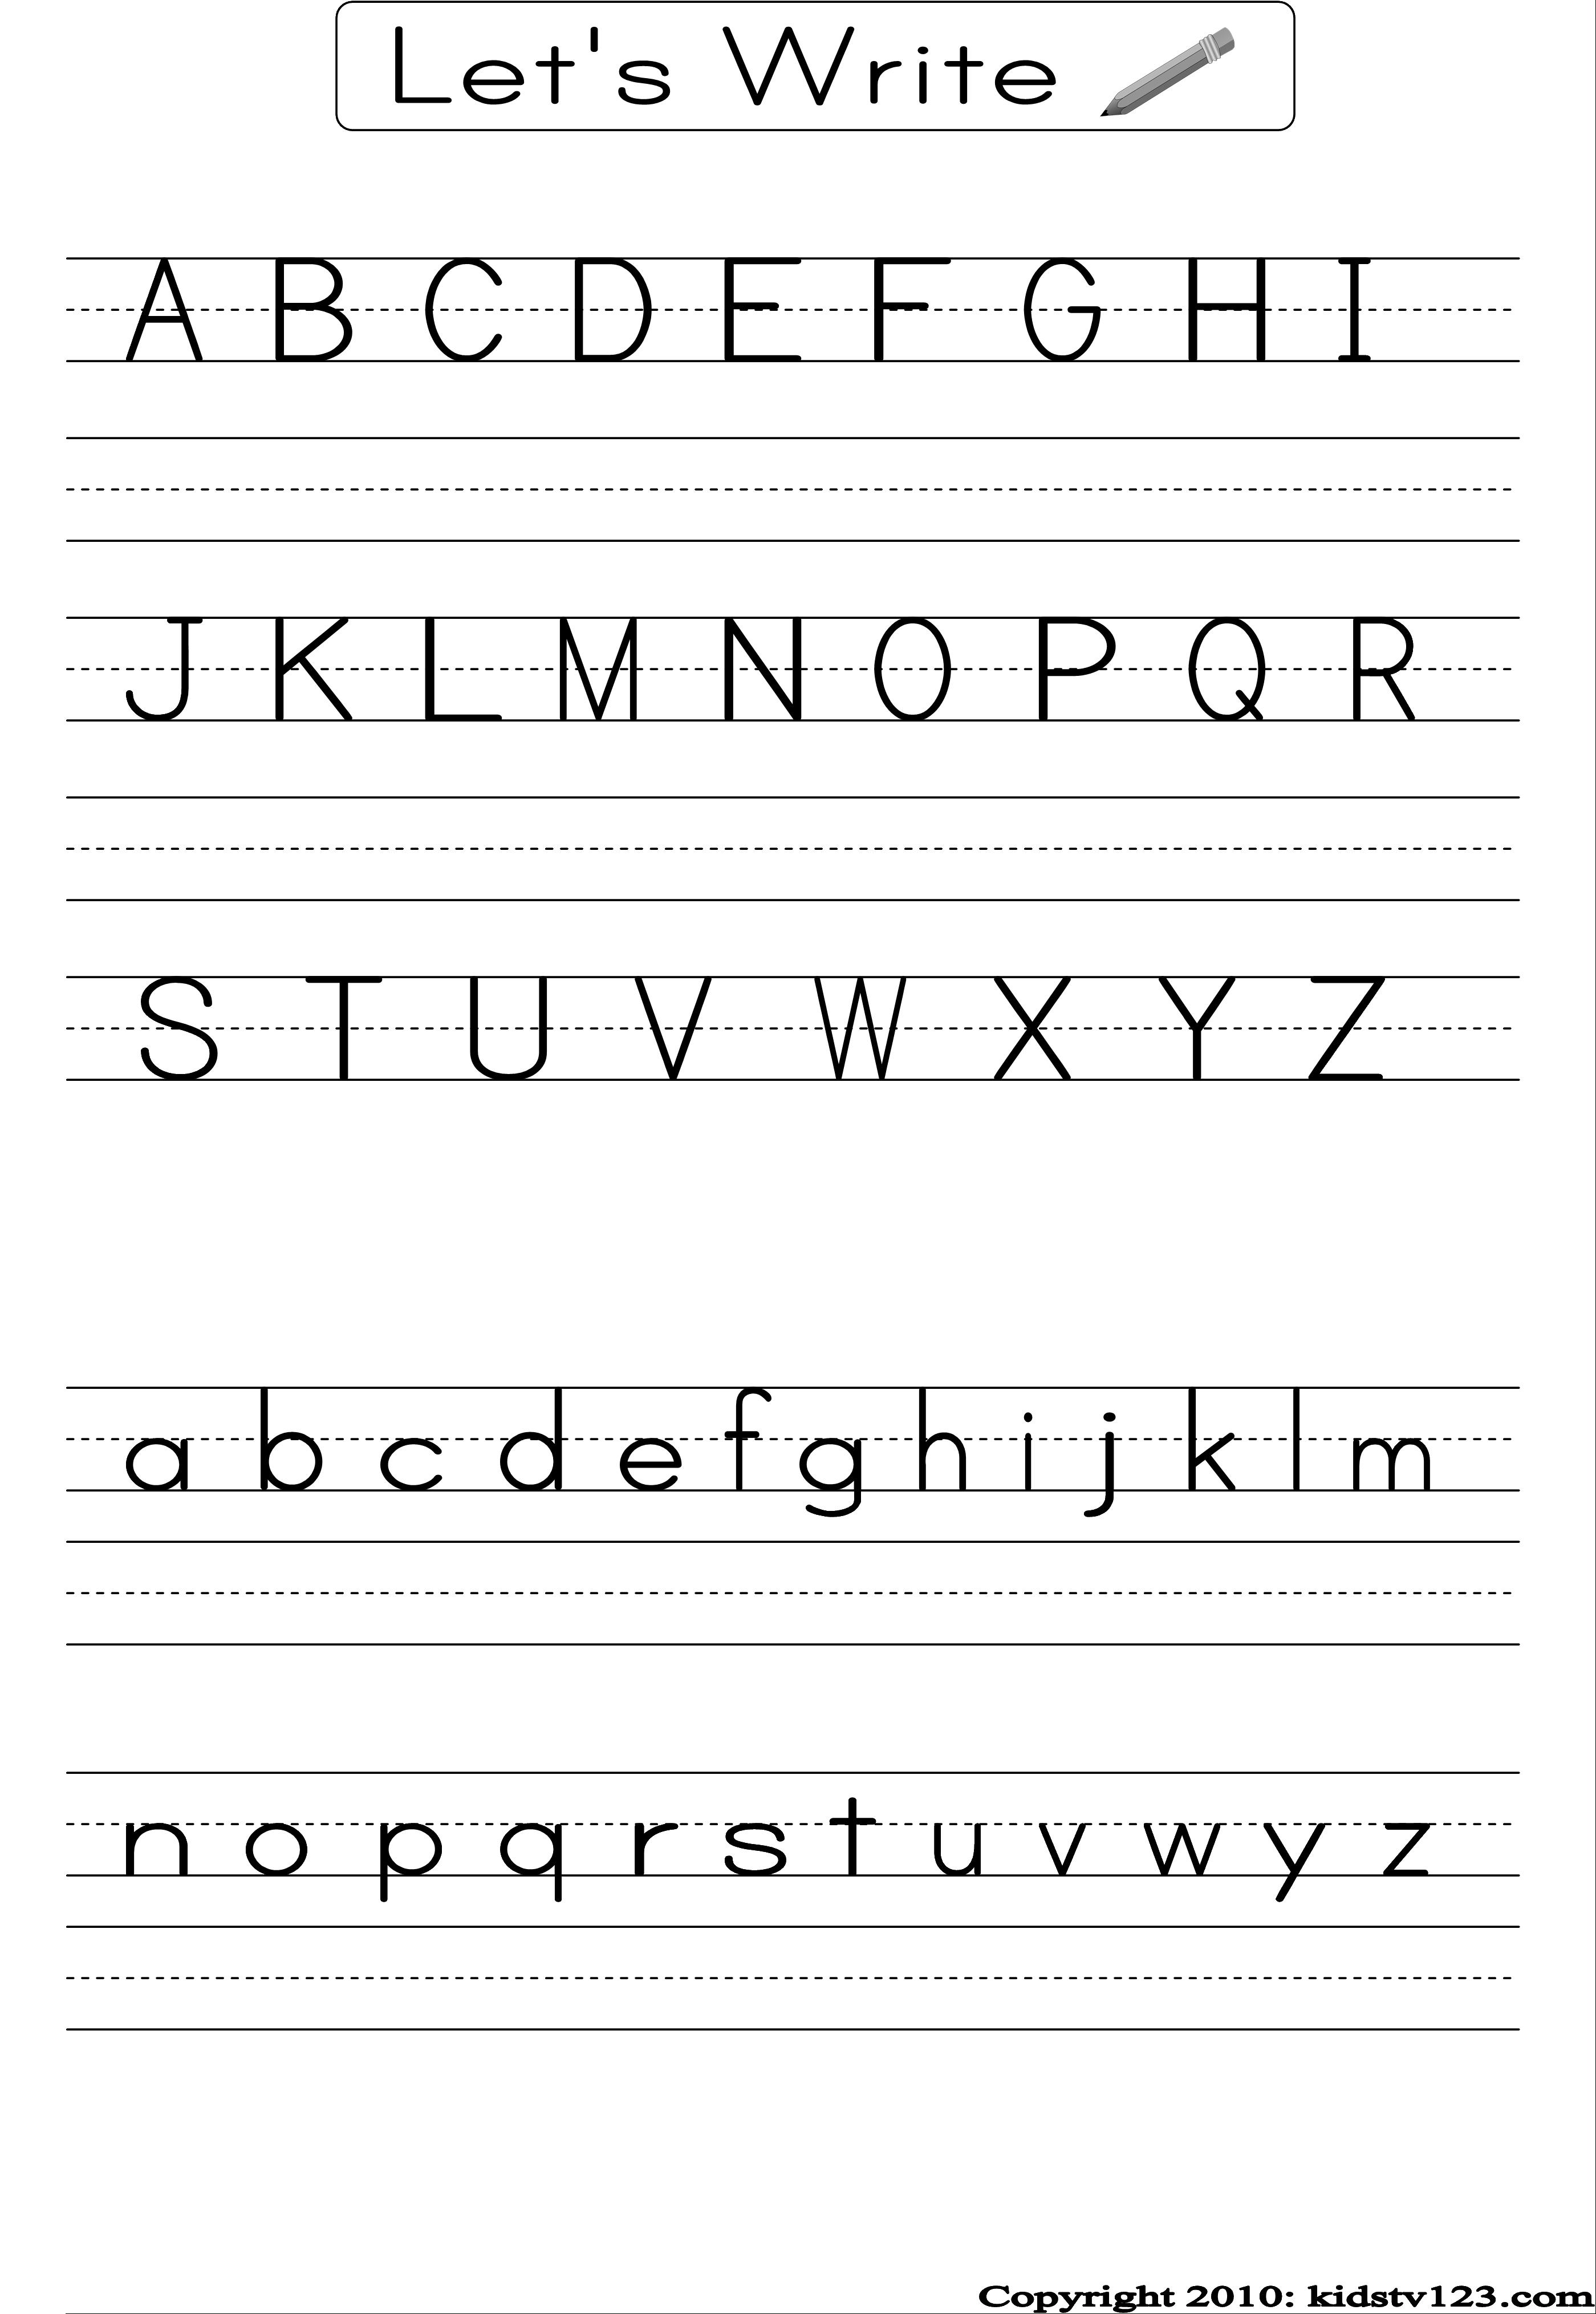 Alphabet Writing Practice Sheet | Edu-Fun | Alphabet Worksheets | Free Printable Handwriting Worksheets For Preschool